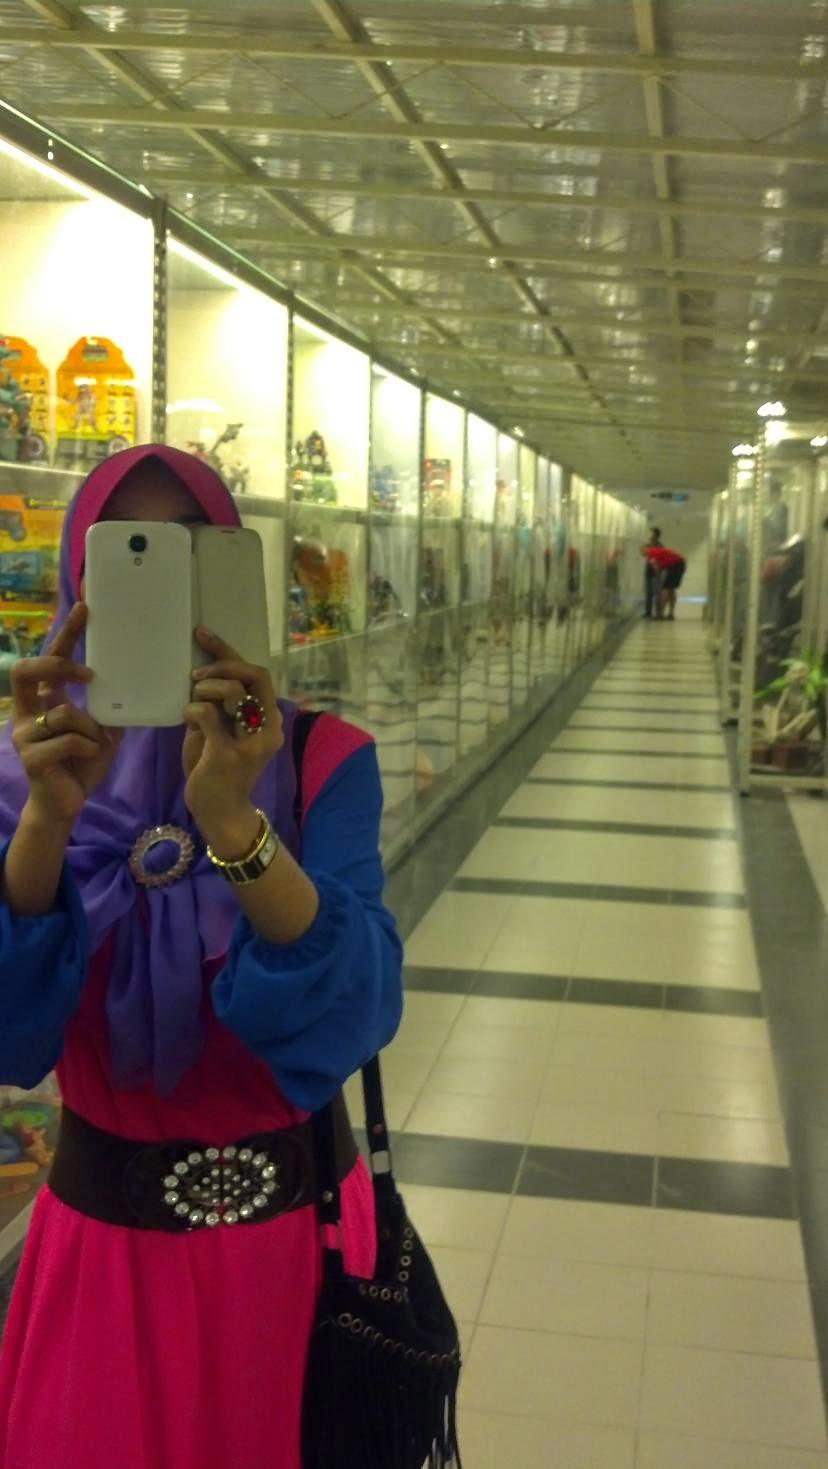 toy museum history,sejarah muzium mainan pulau pinang